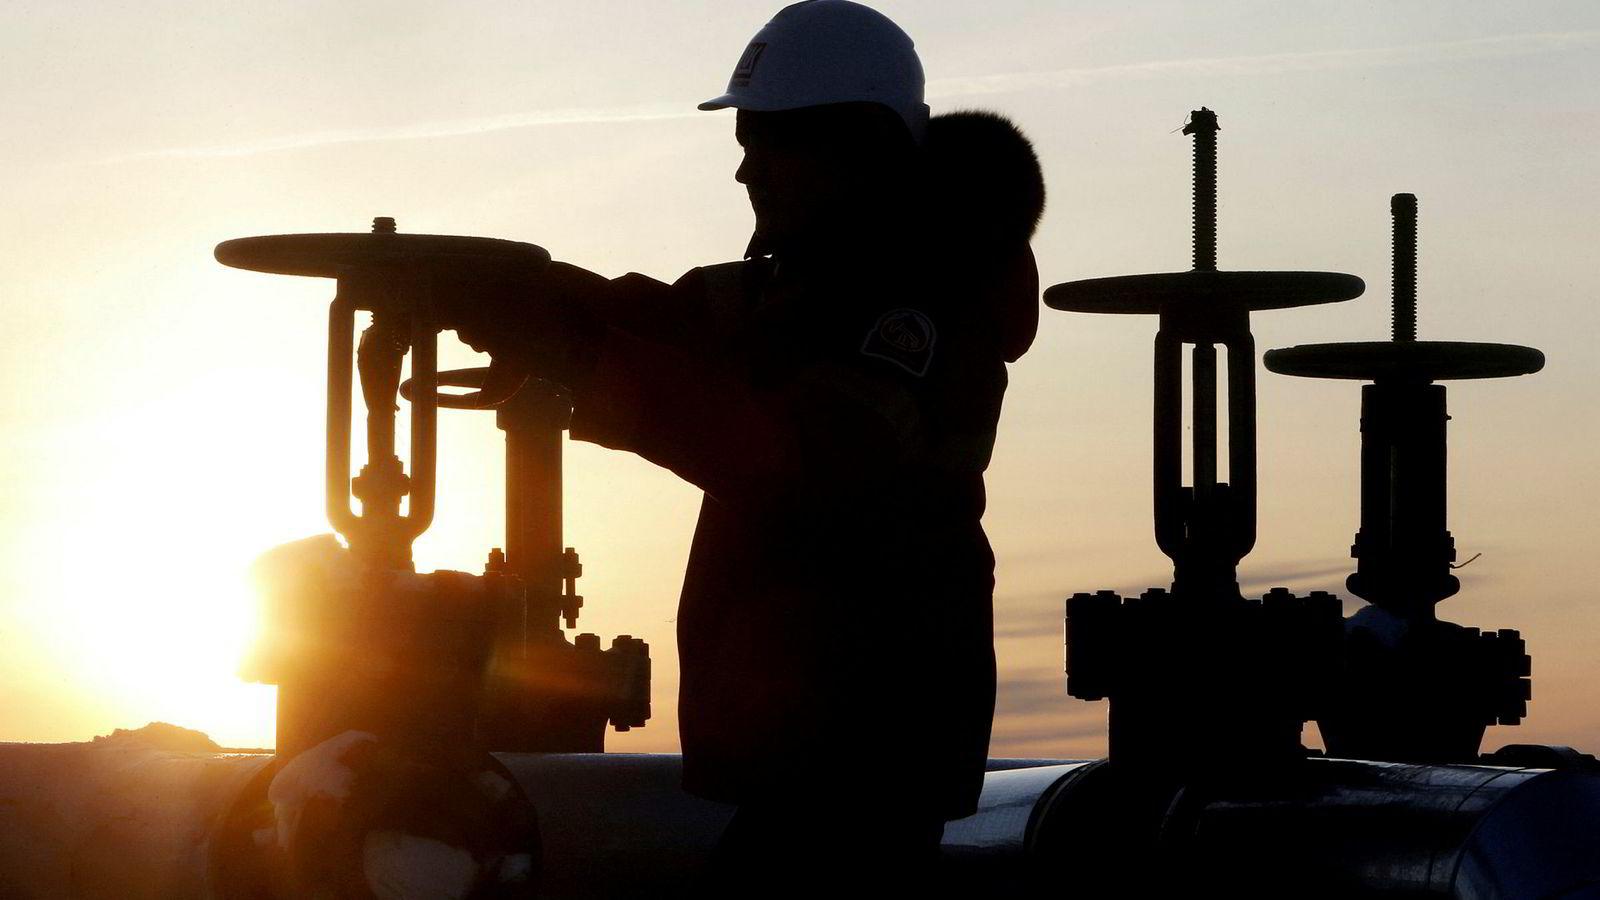 Oljeprisen stiger kraftig mandag morgen. Her jobber en oljearbeider på et oljefelt nær Kogalym i Russland.